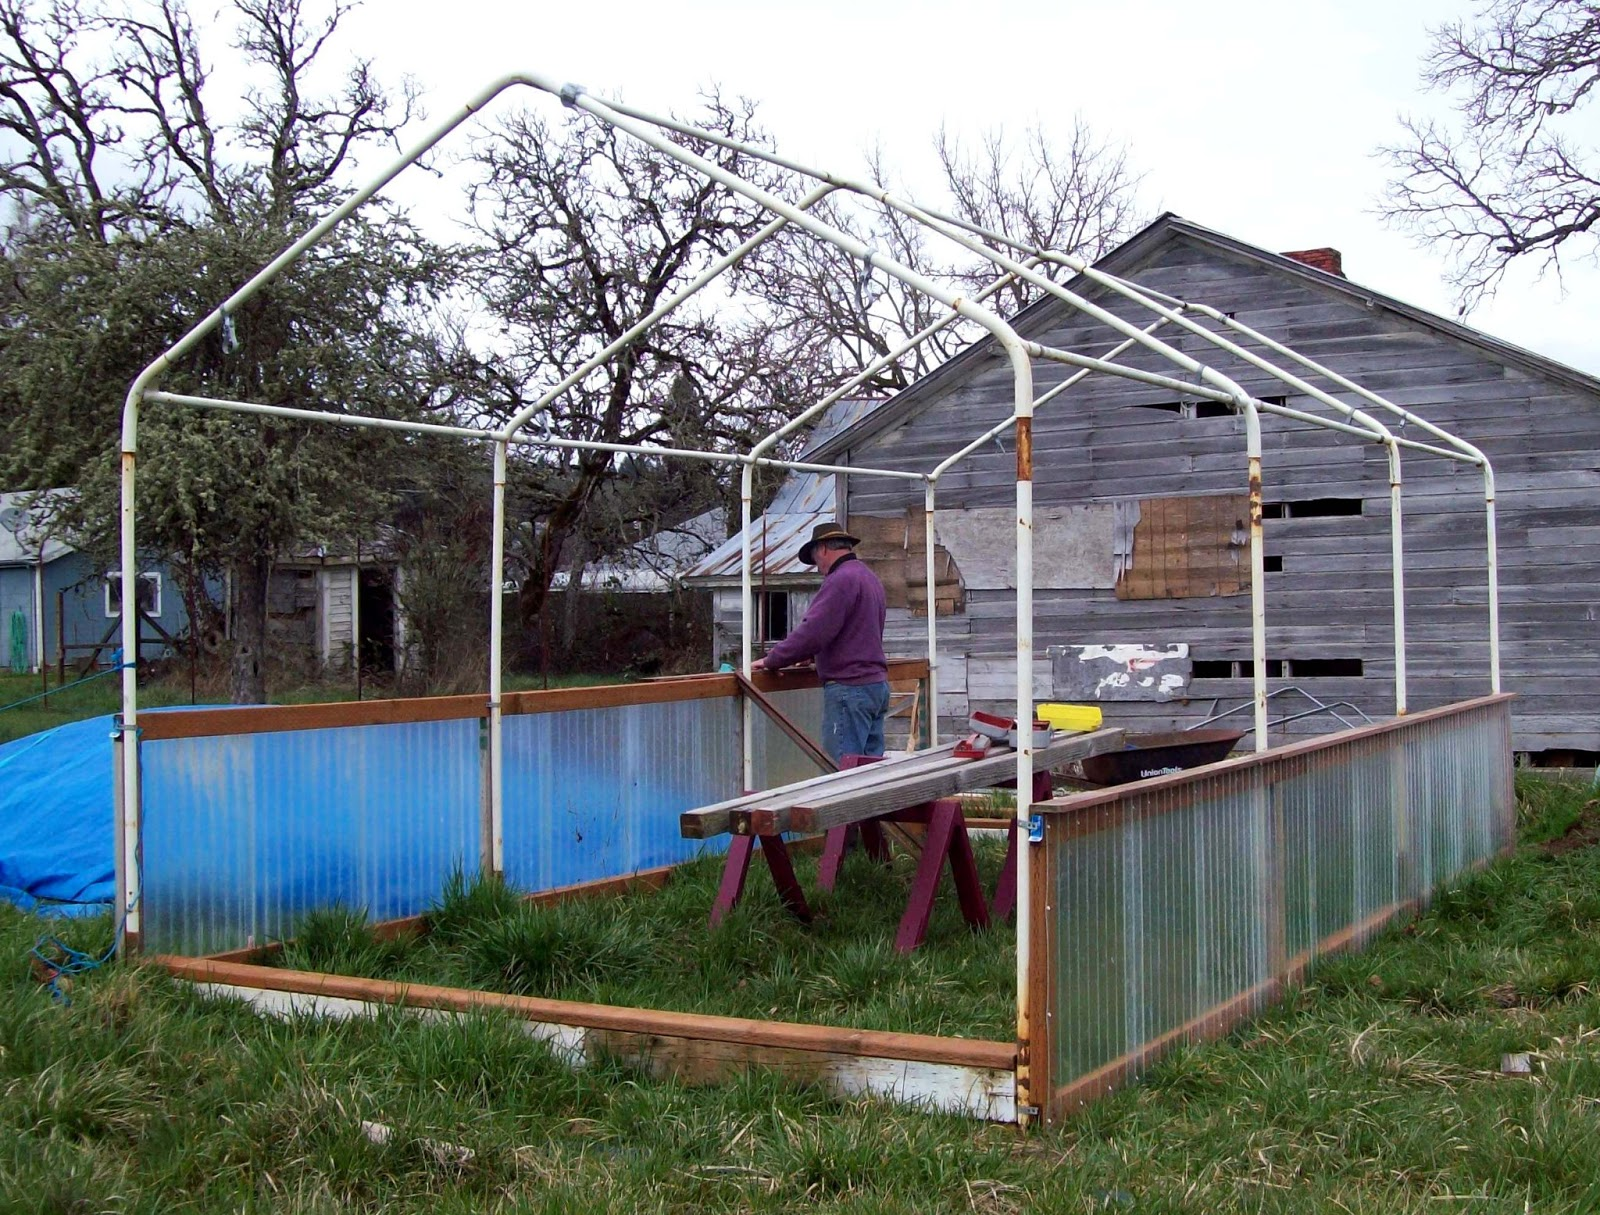 Carport Greenhouse Canopy : Quot sharing gardens carport frame greenhouse design